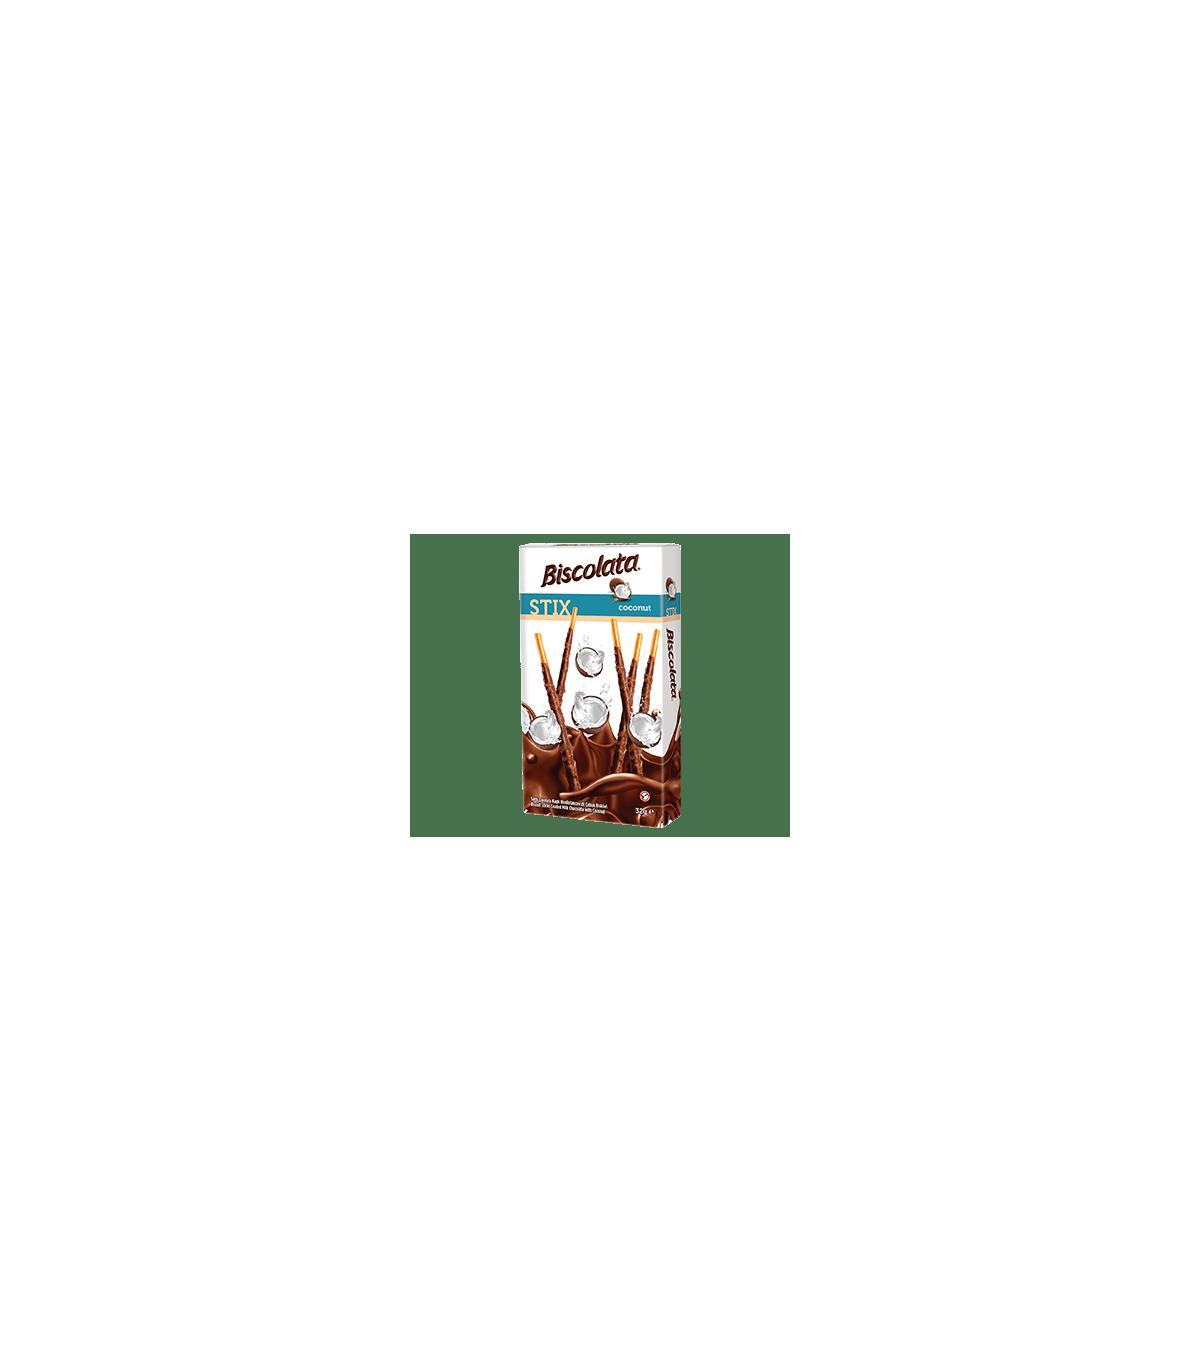 Solen چوب شکلاتی بیسکولاتا استیکس نارگیلی 40 گرمی شولن